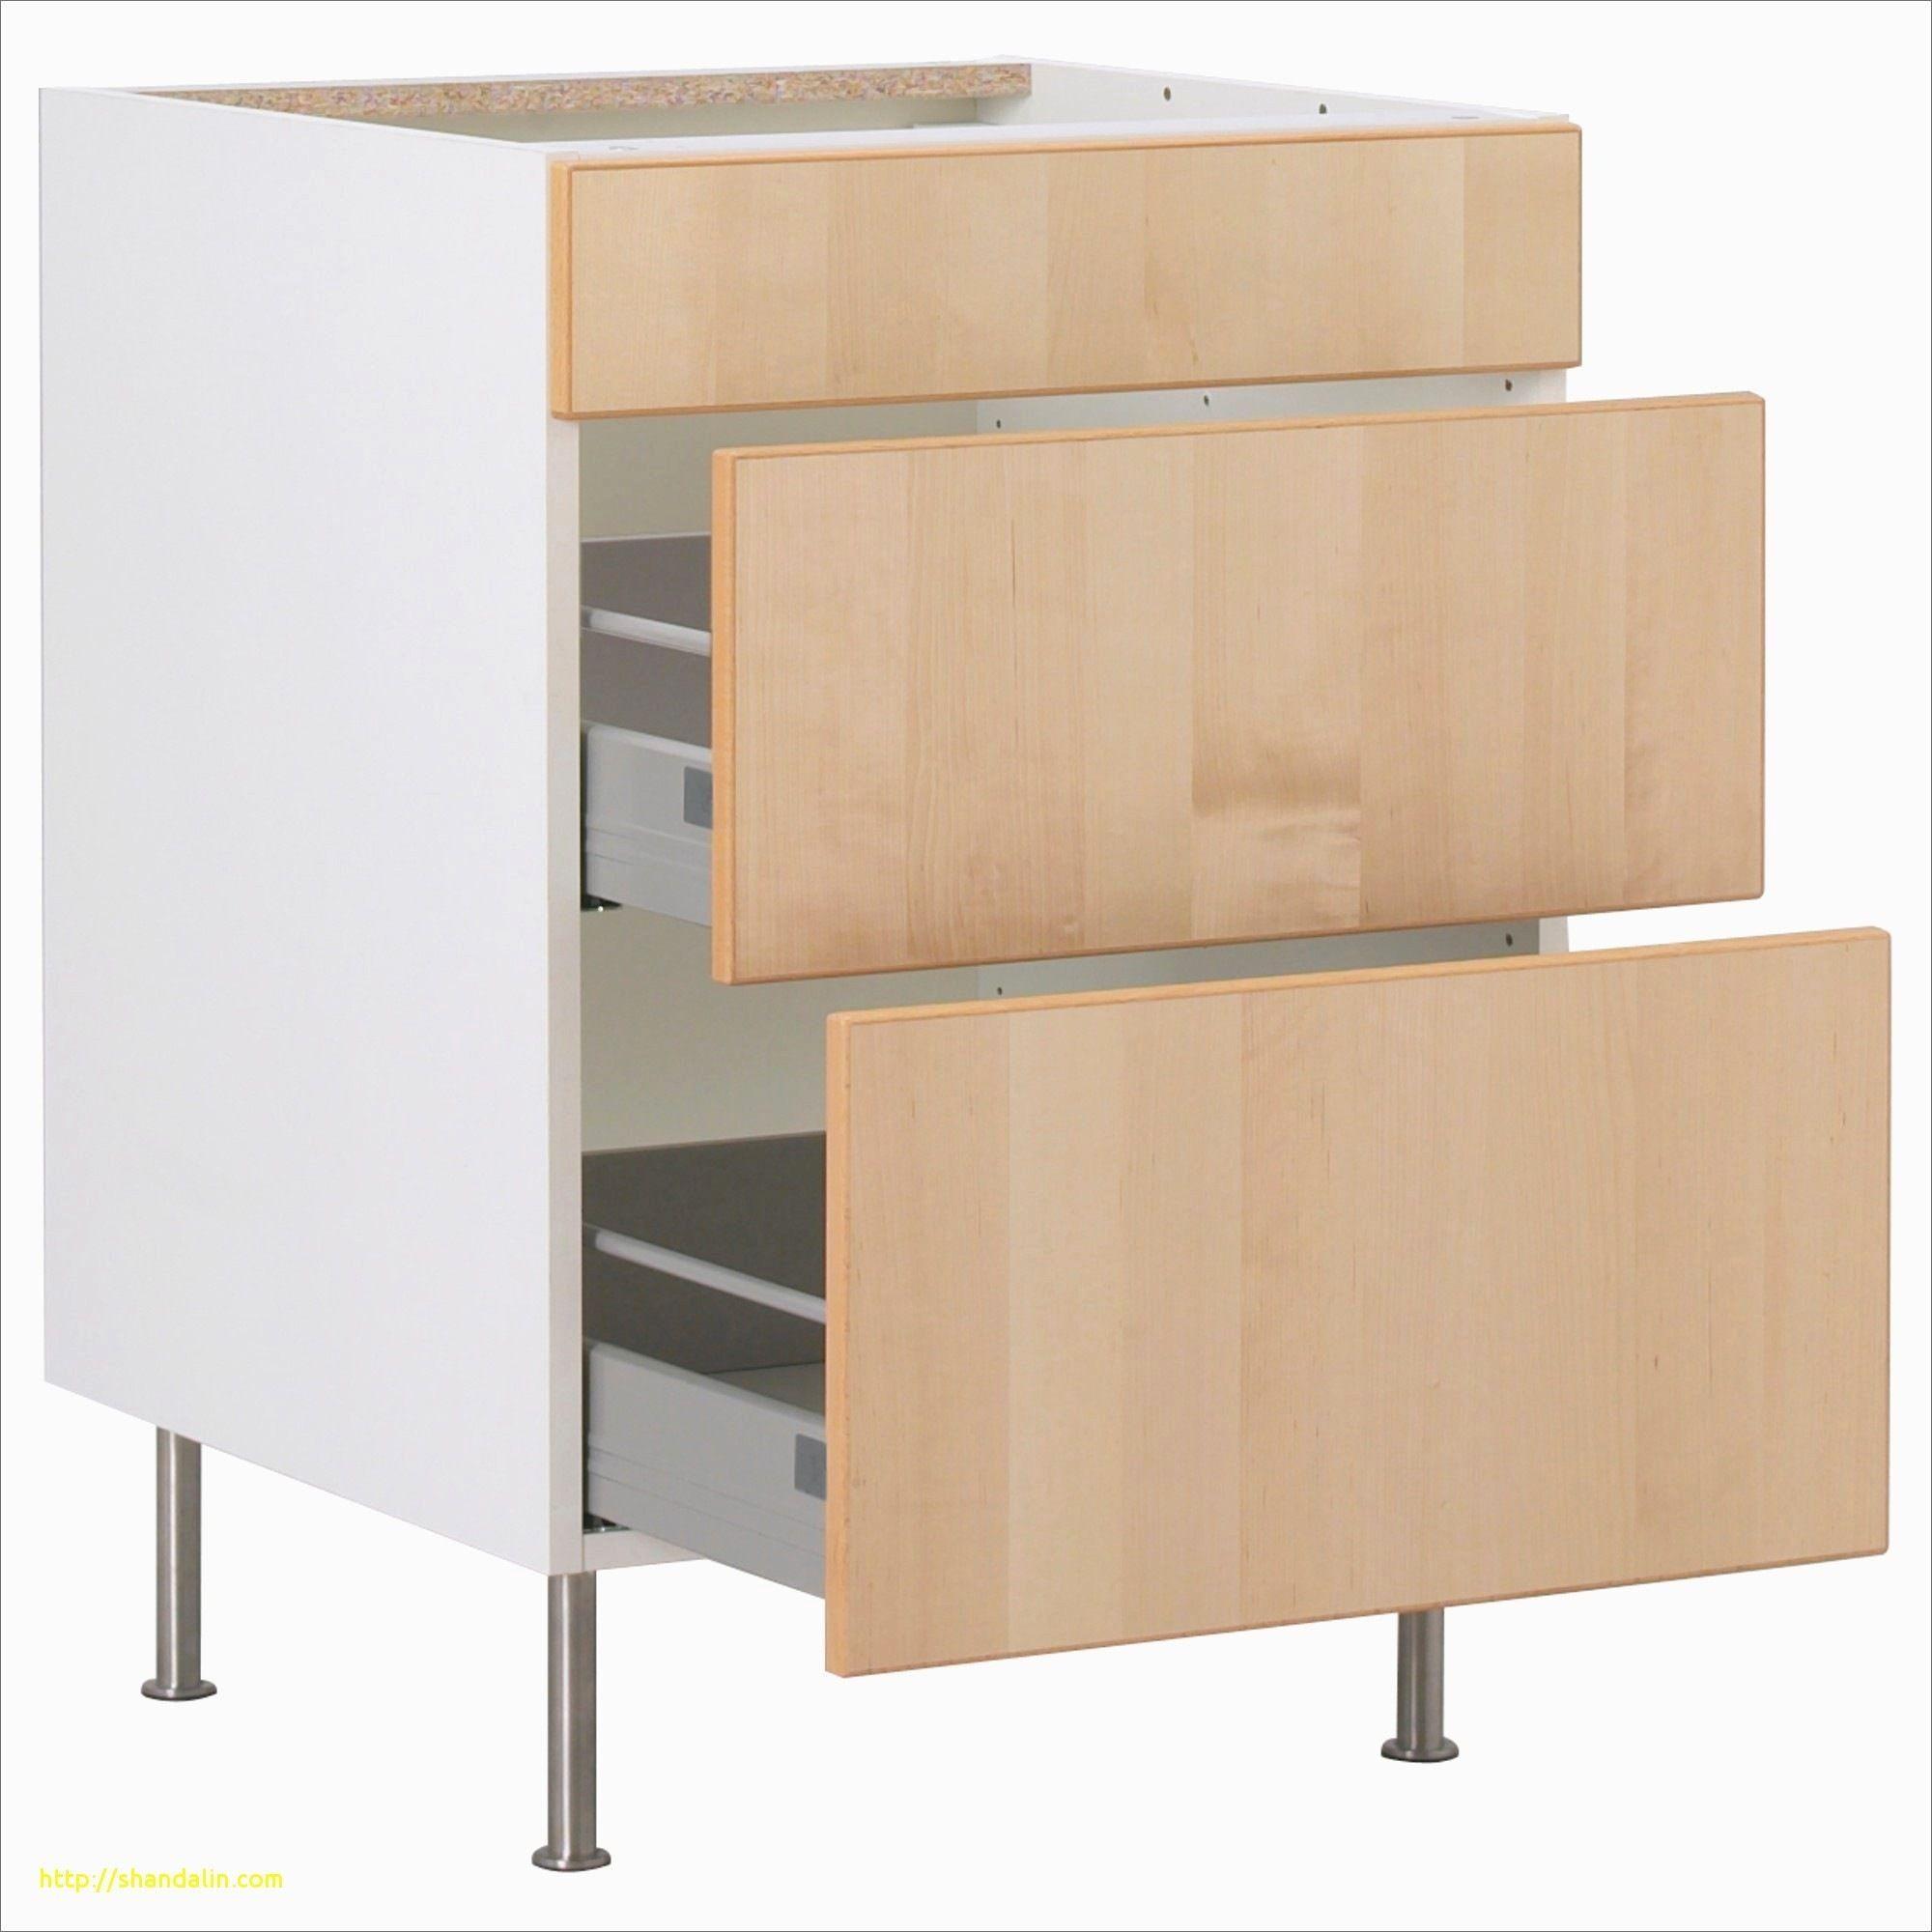 Meuble 50 Cm De Large Ideas Meuble Cuisine Meuble De Cuisine Ikea Meuble Bas Cuisine